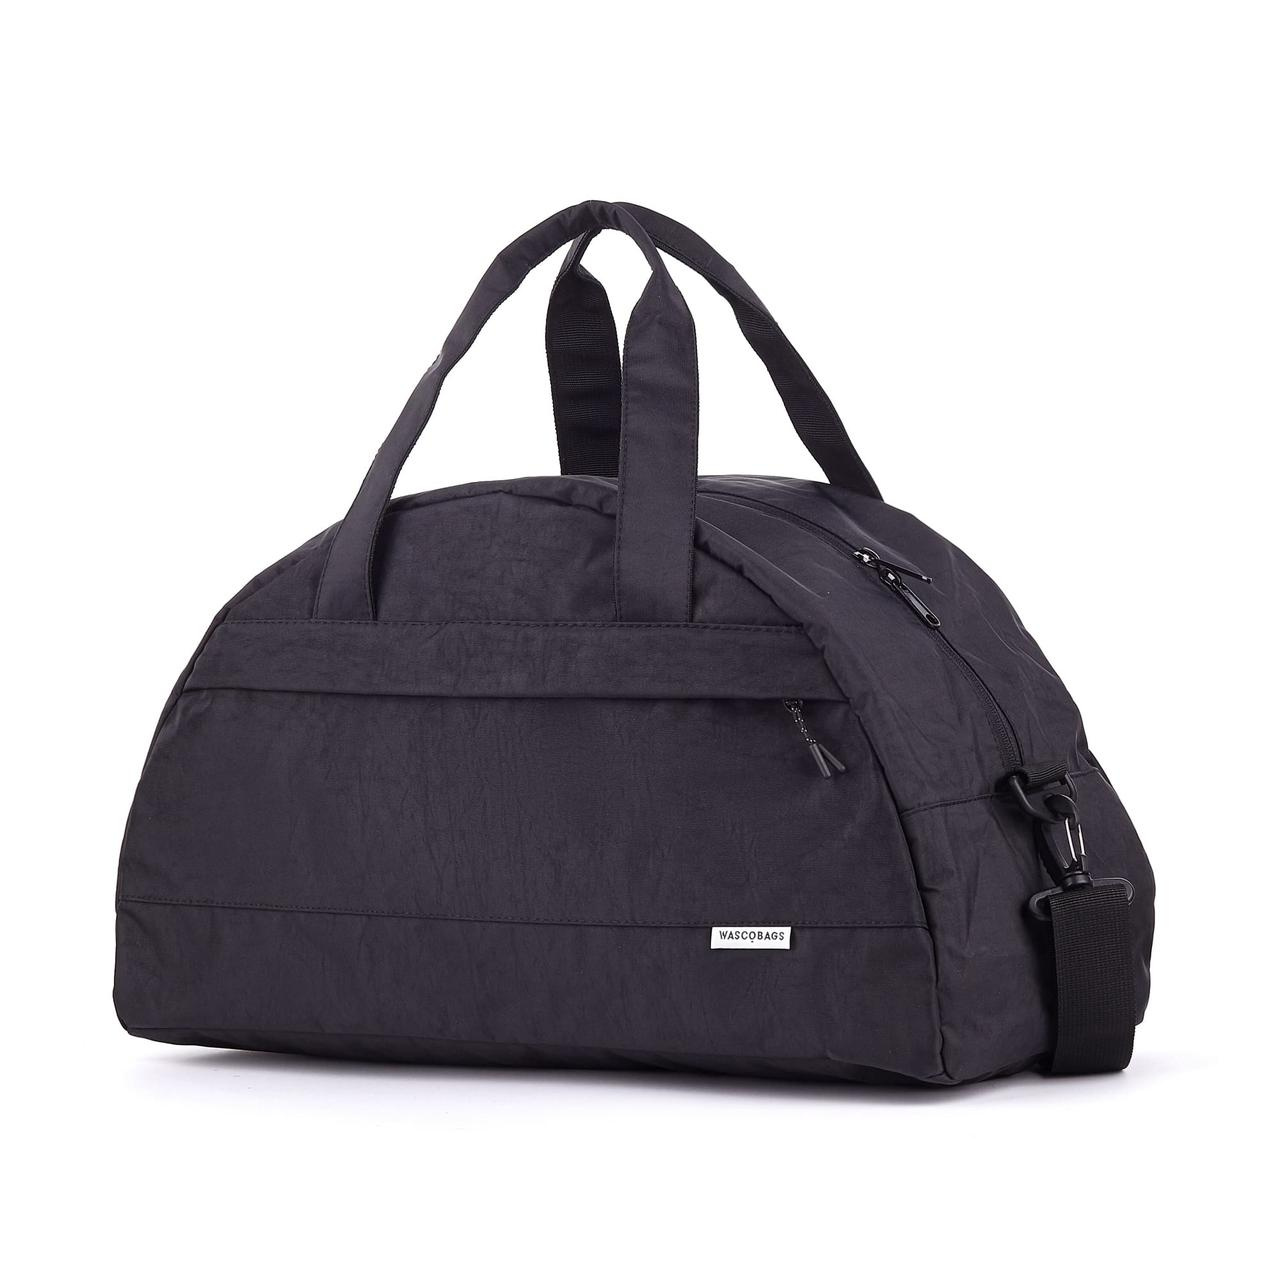 Дорожная сумка Wascobags Valencia Черная (25 L)